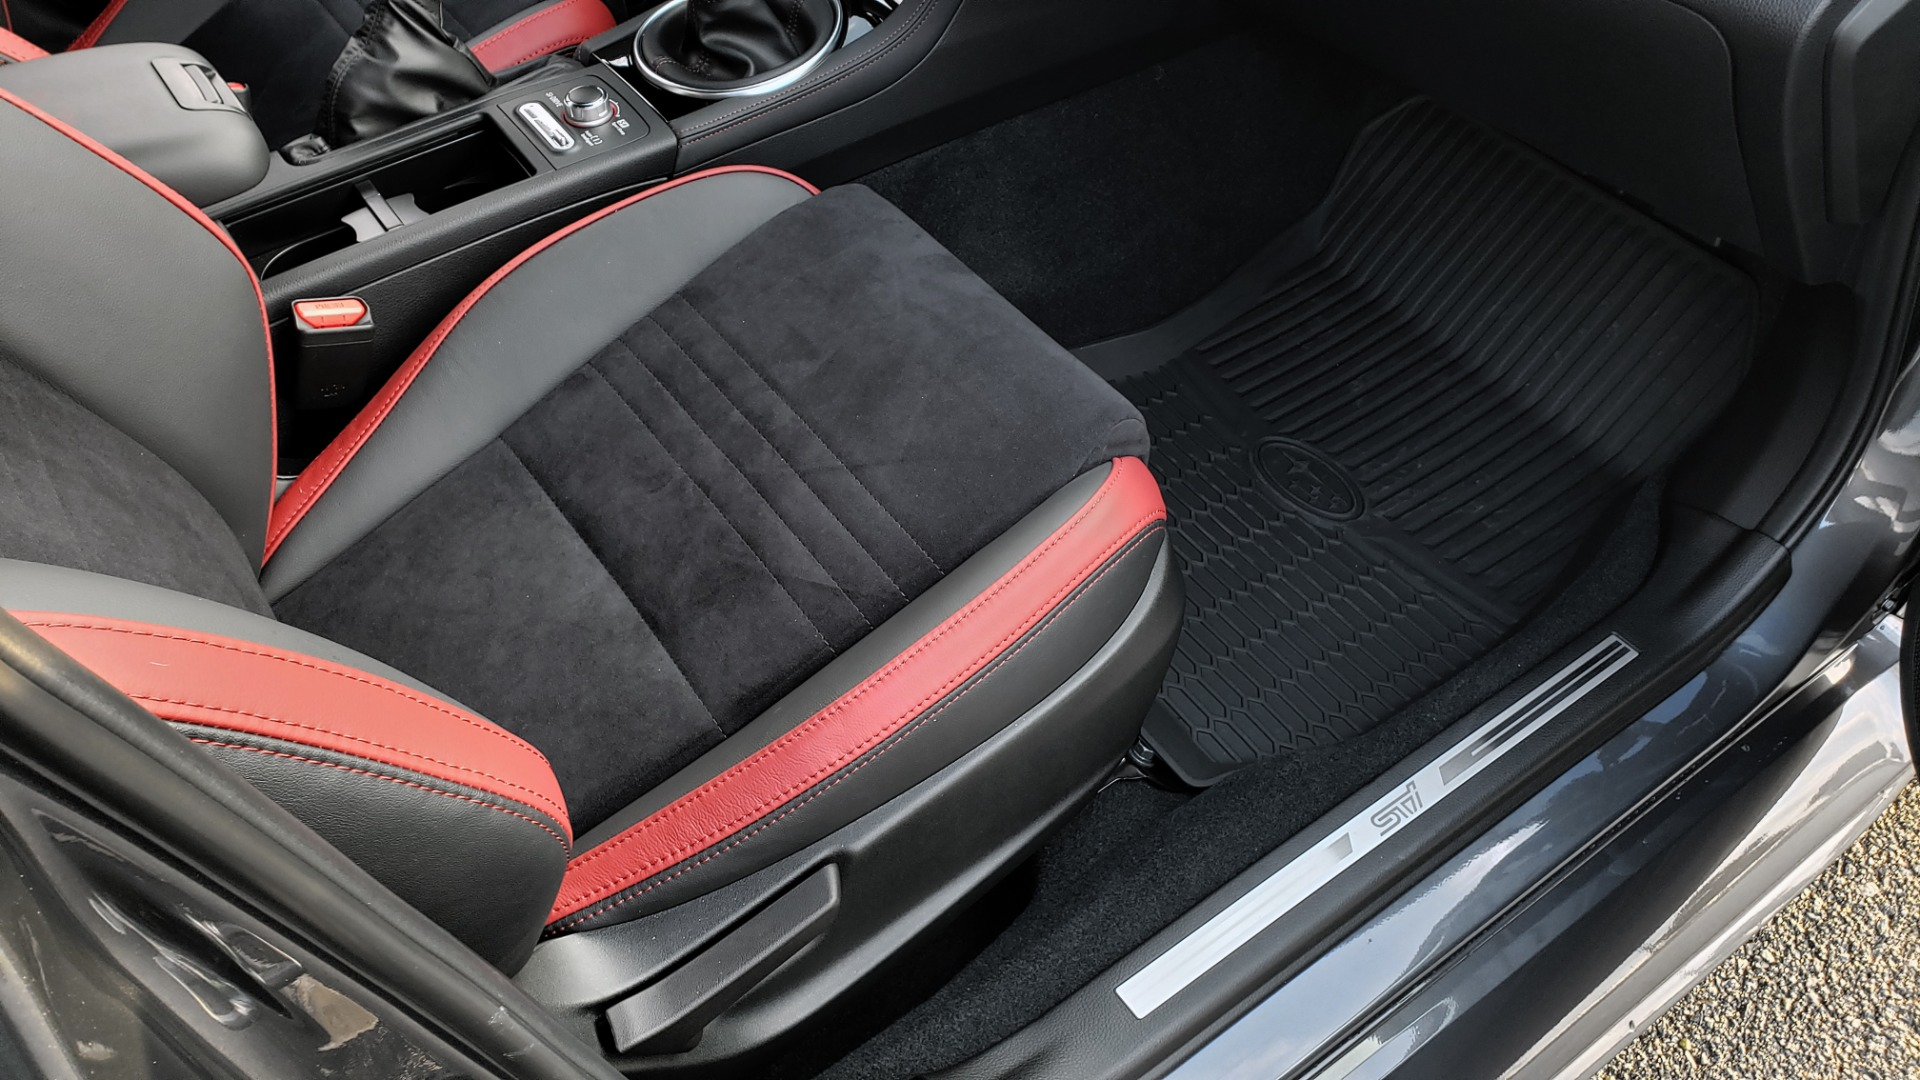 Used 2020 Subaru WRX STI 2.5L TURBO / 6-SPEED MANUAL / RECARO SEATS / REARVIEW for sale Sold at Formula Imports in Charlotte NC 28227 17